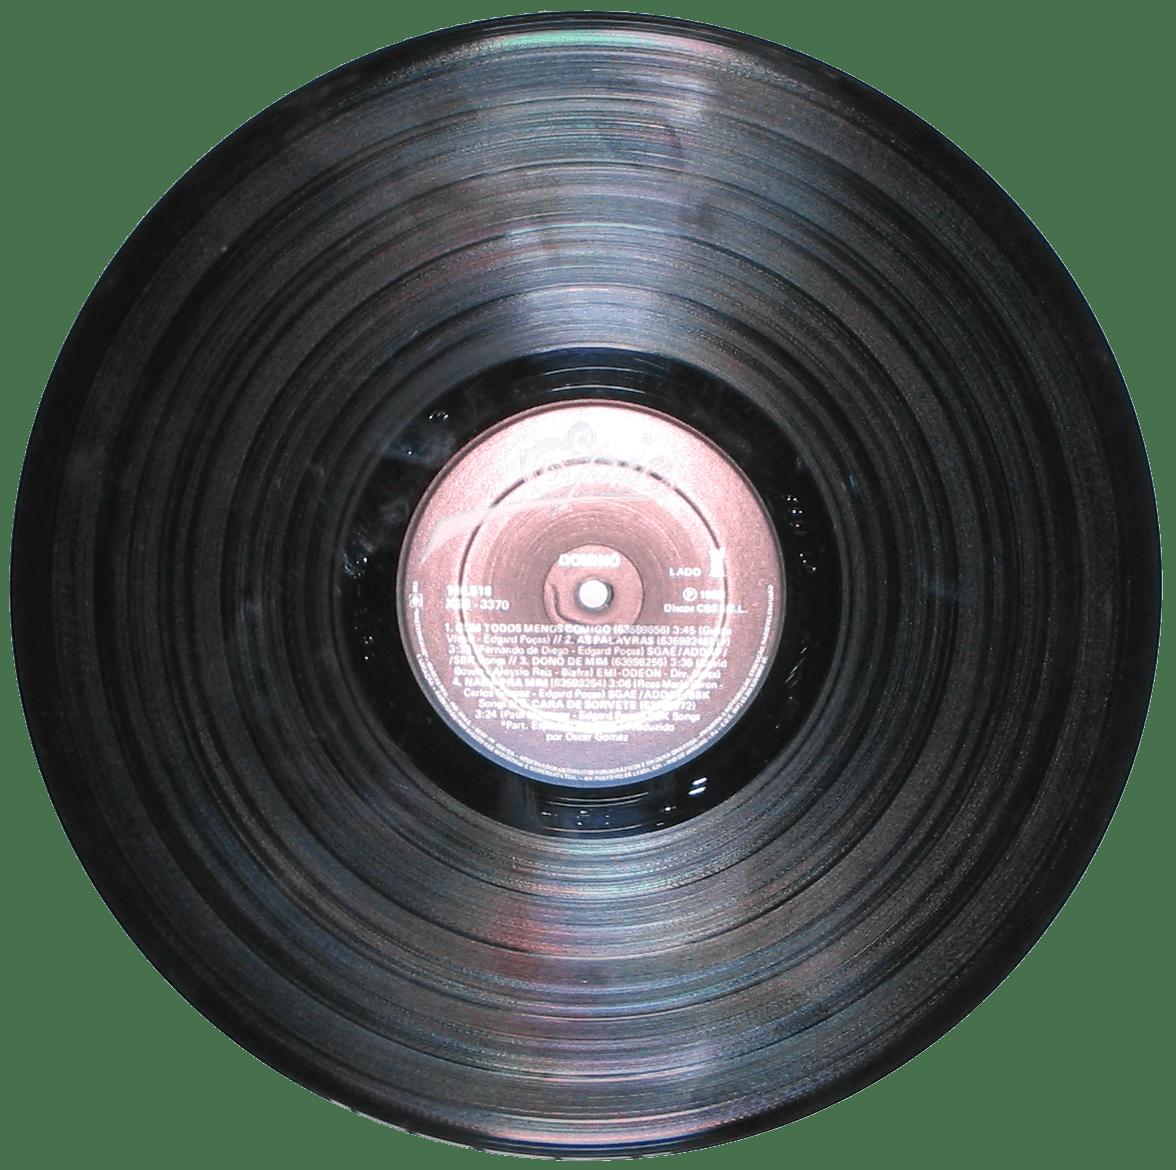 Long-playing Record (LP)